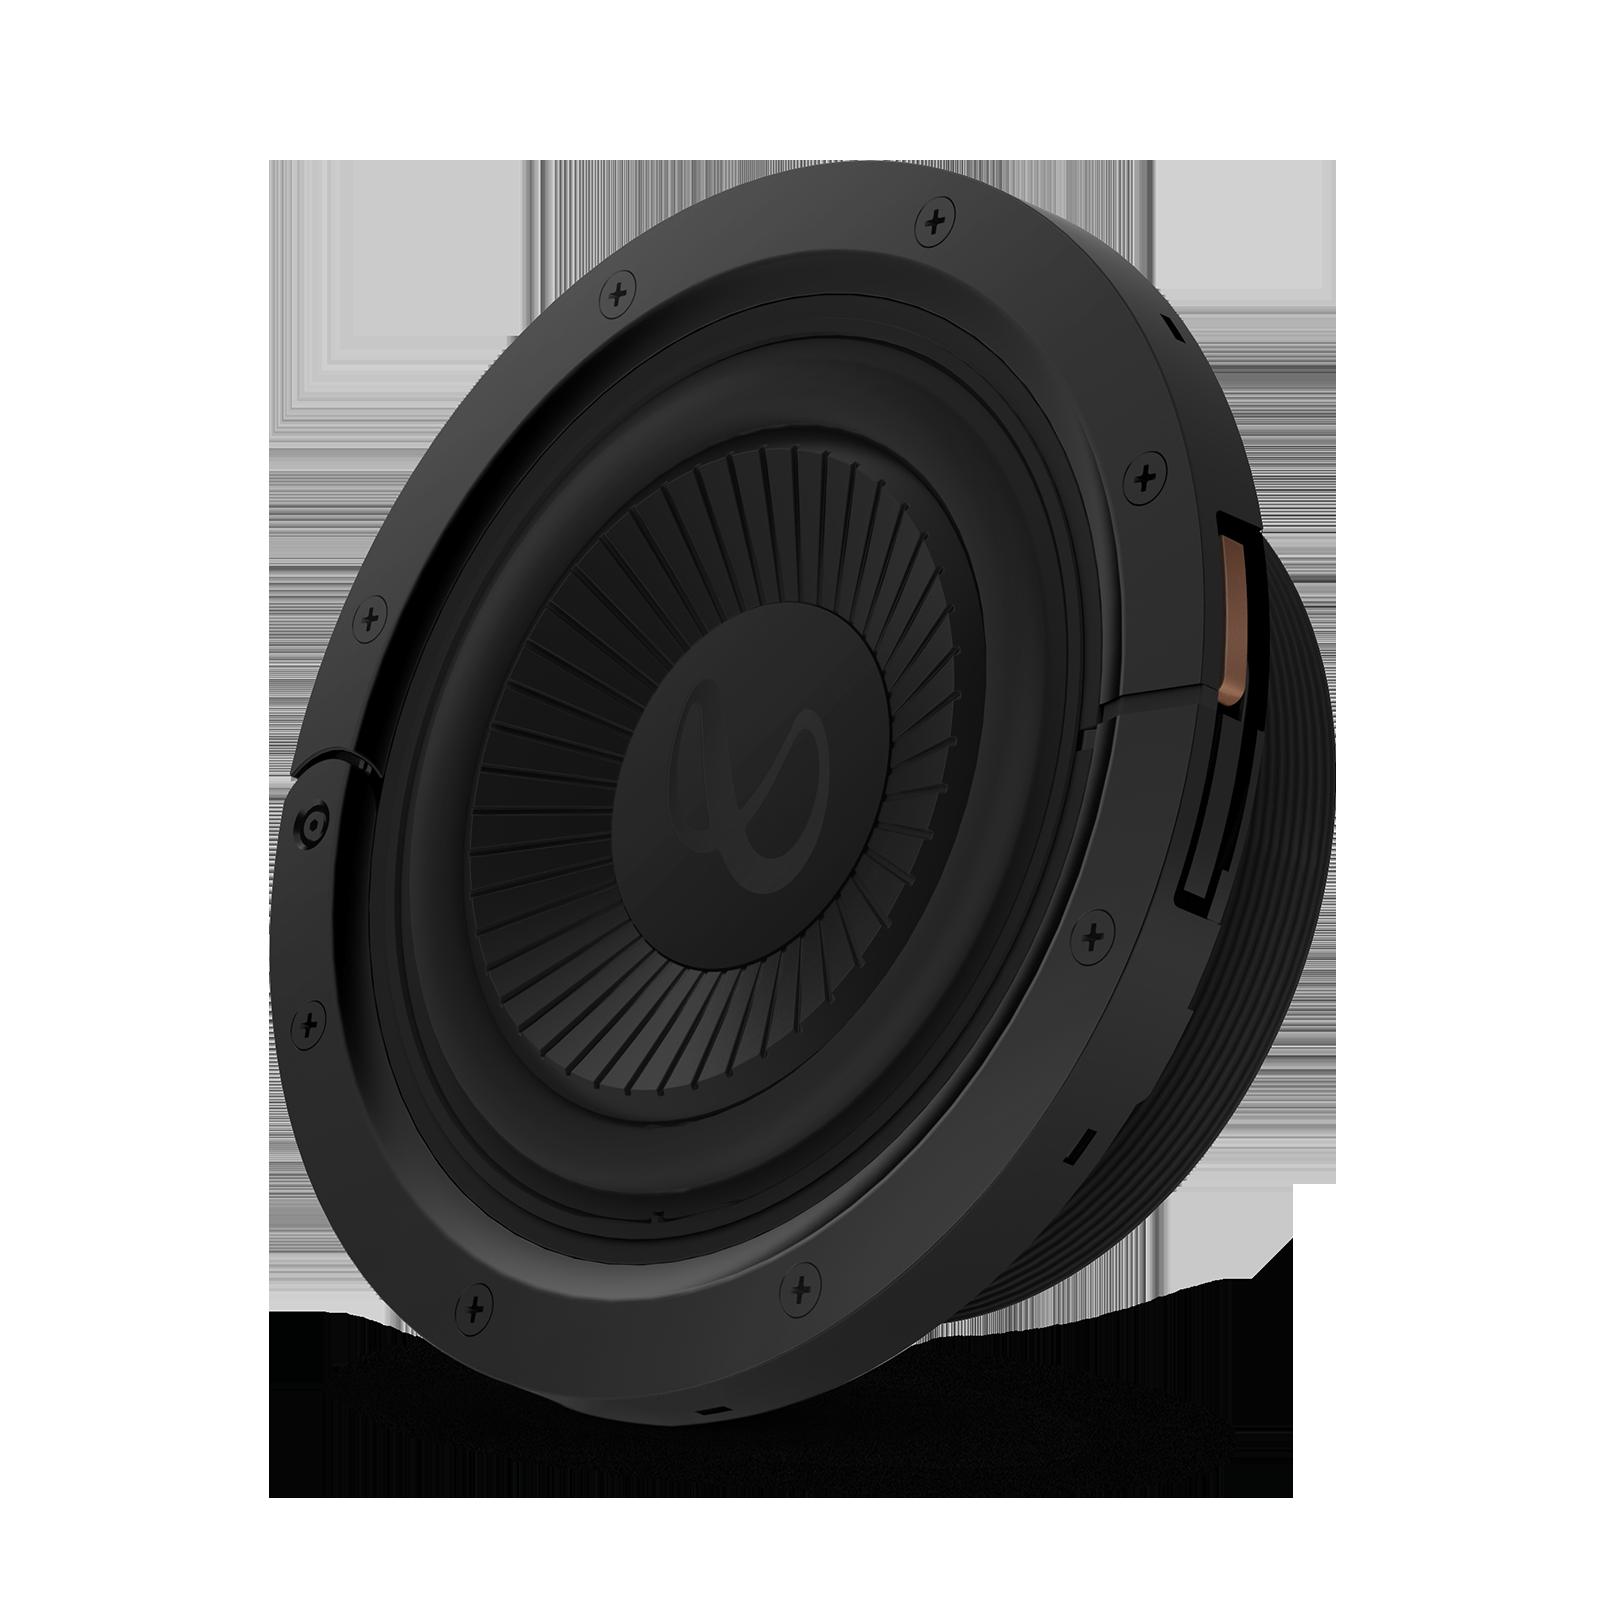 "Reference Flex Woofer 8s - Black - 8"" (200mm) adjustable depth car audio subwoofers optimized for factory location upgrades - Hero"